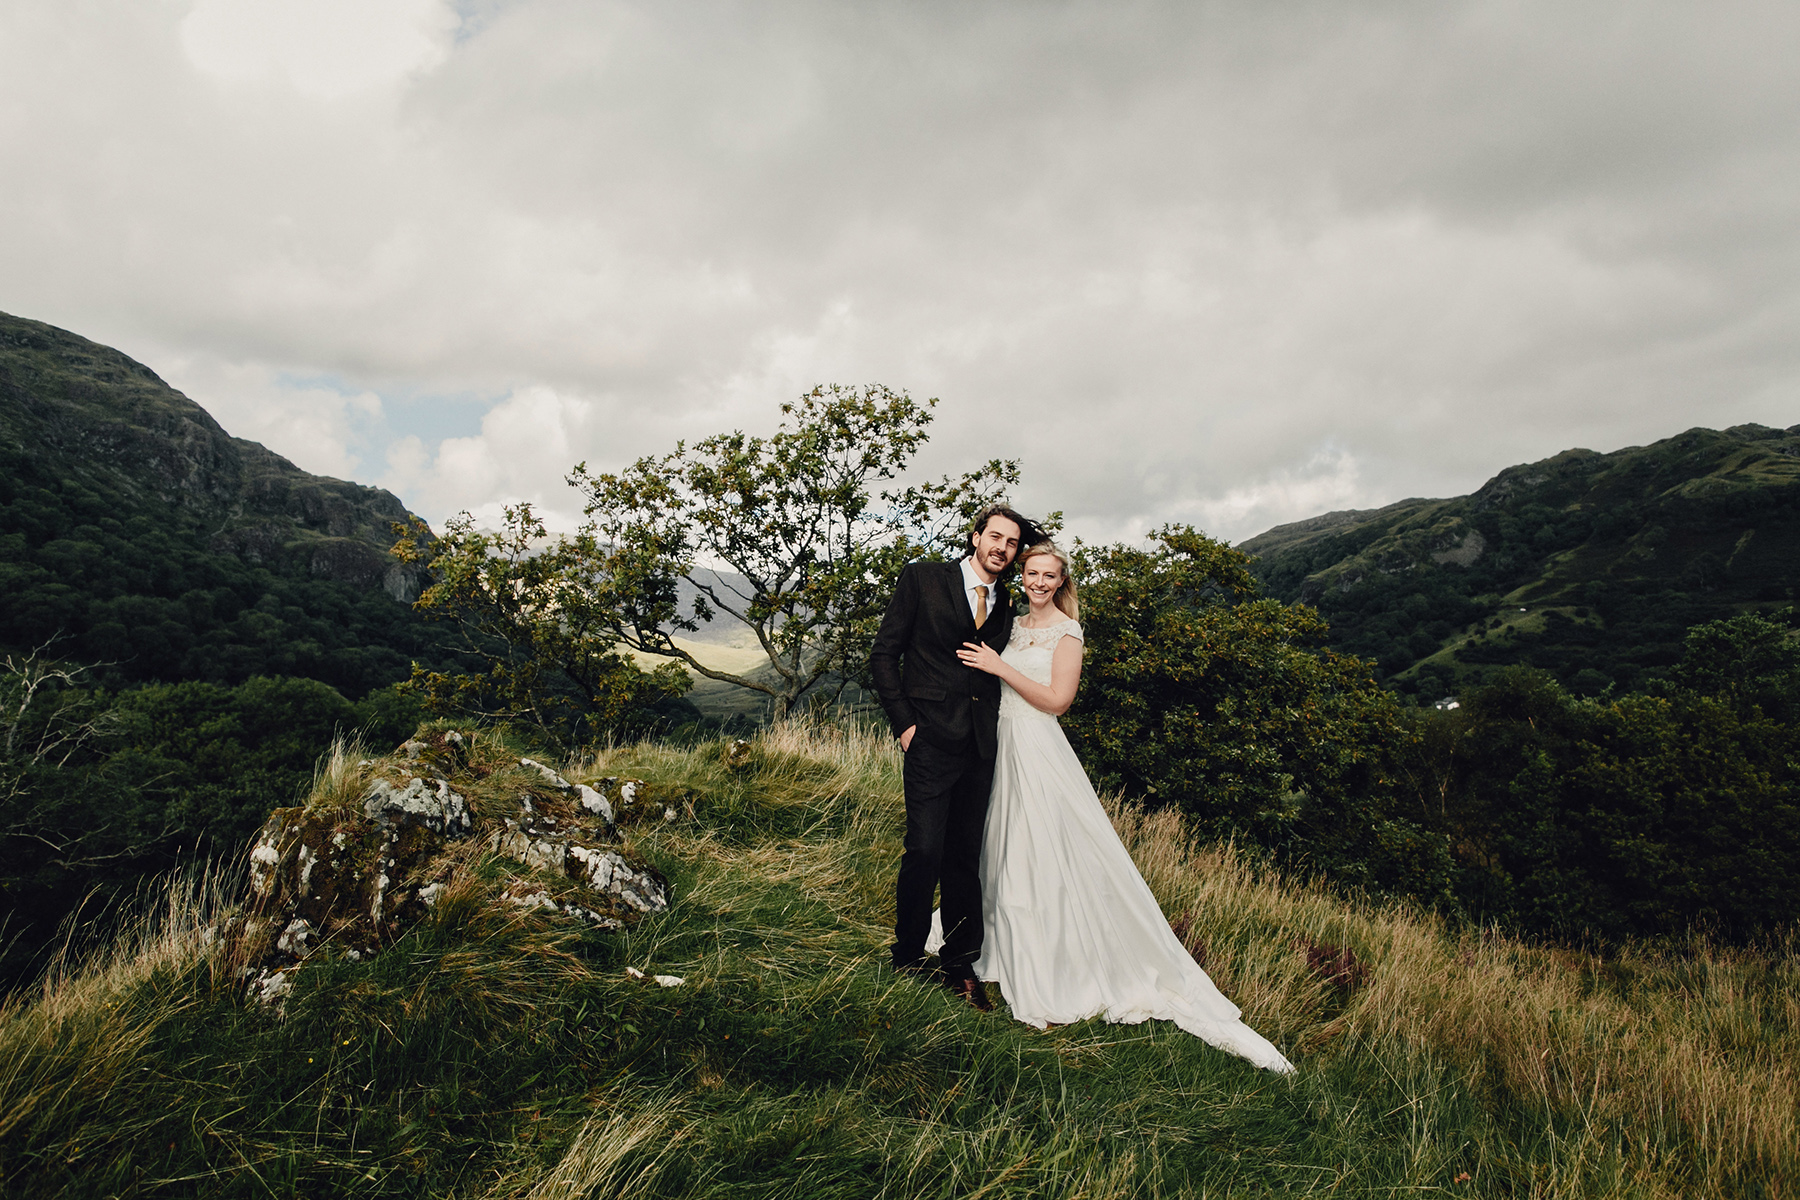 Snowdonia-Wales-Wedding-Photos-0351.jpg